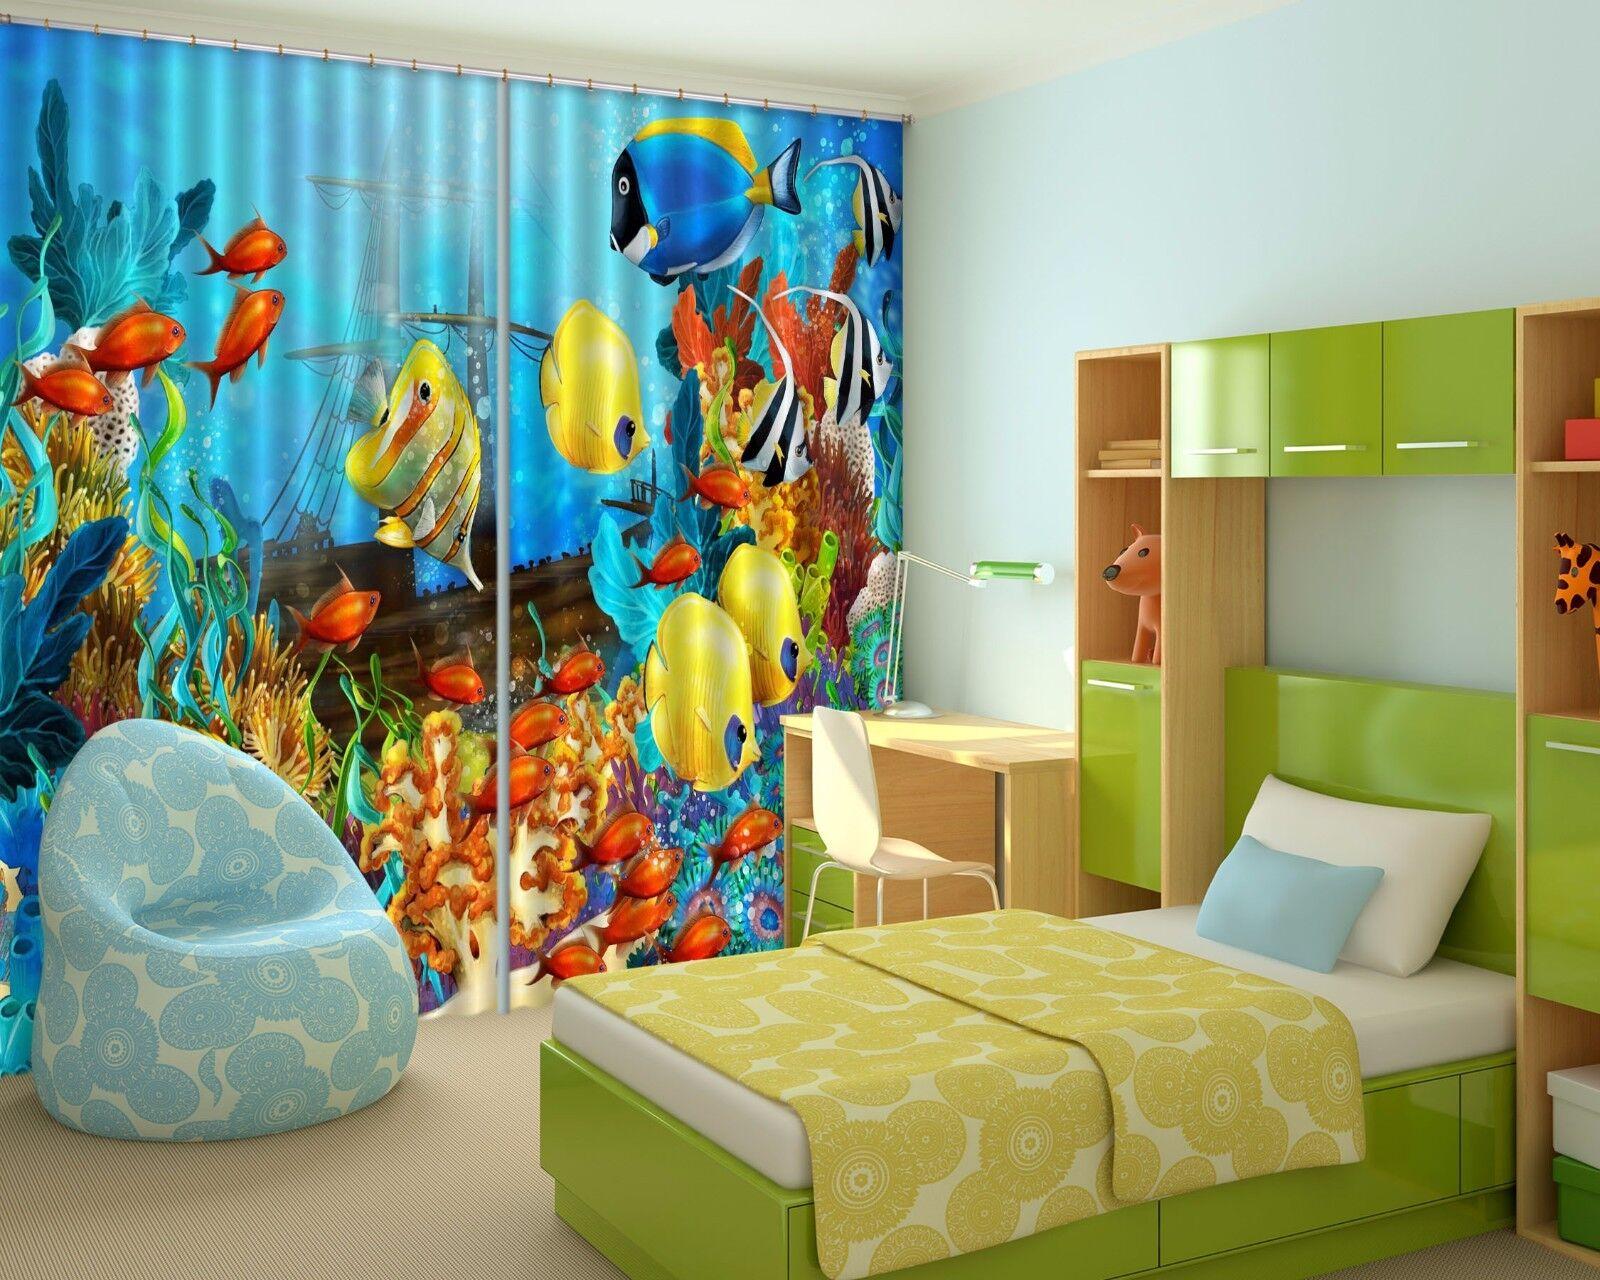 3D peces marinos 6 Cortinas de impresión de cortina de foto Blockout Tela Cortinas Ventana au